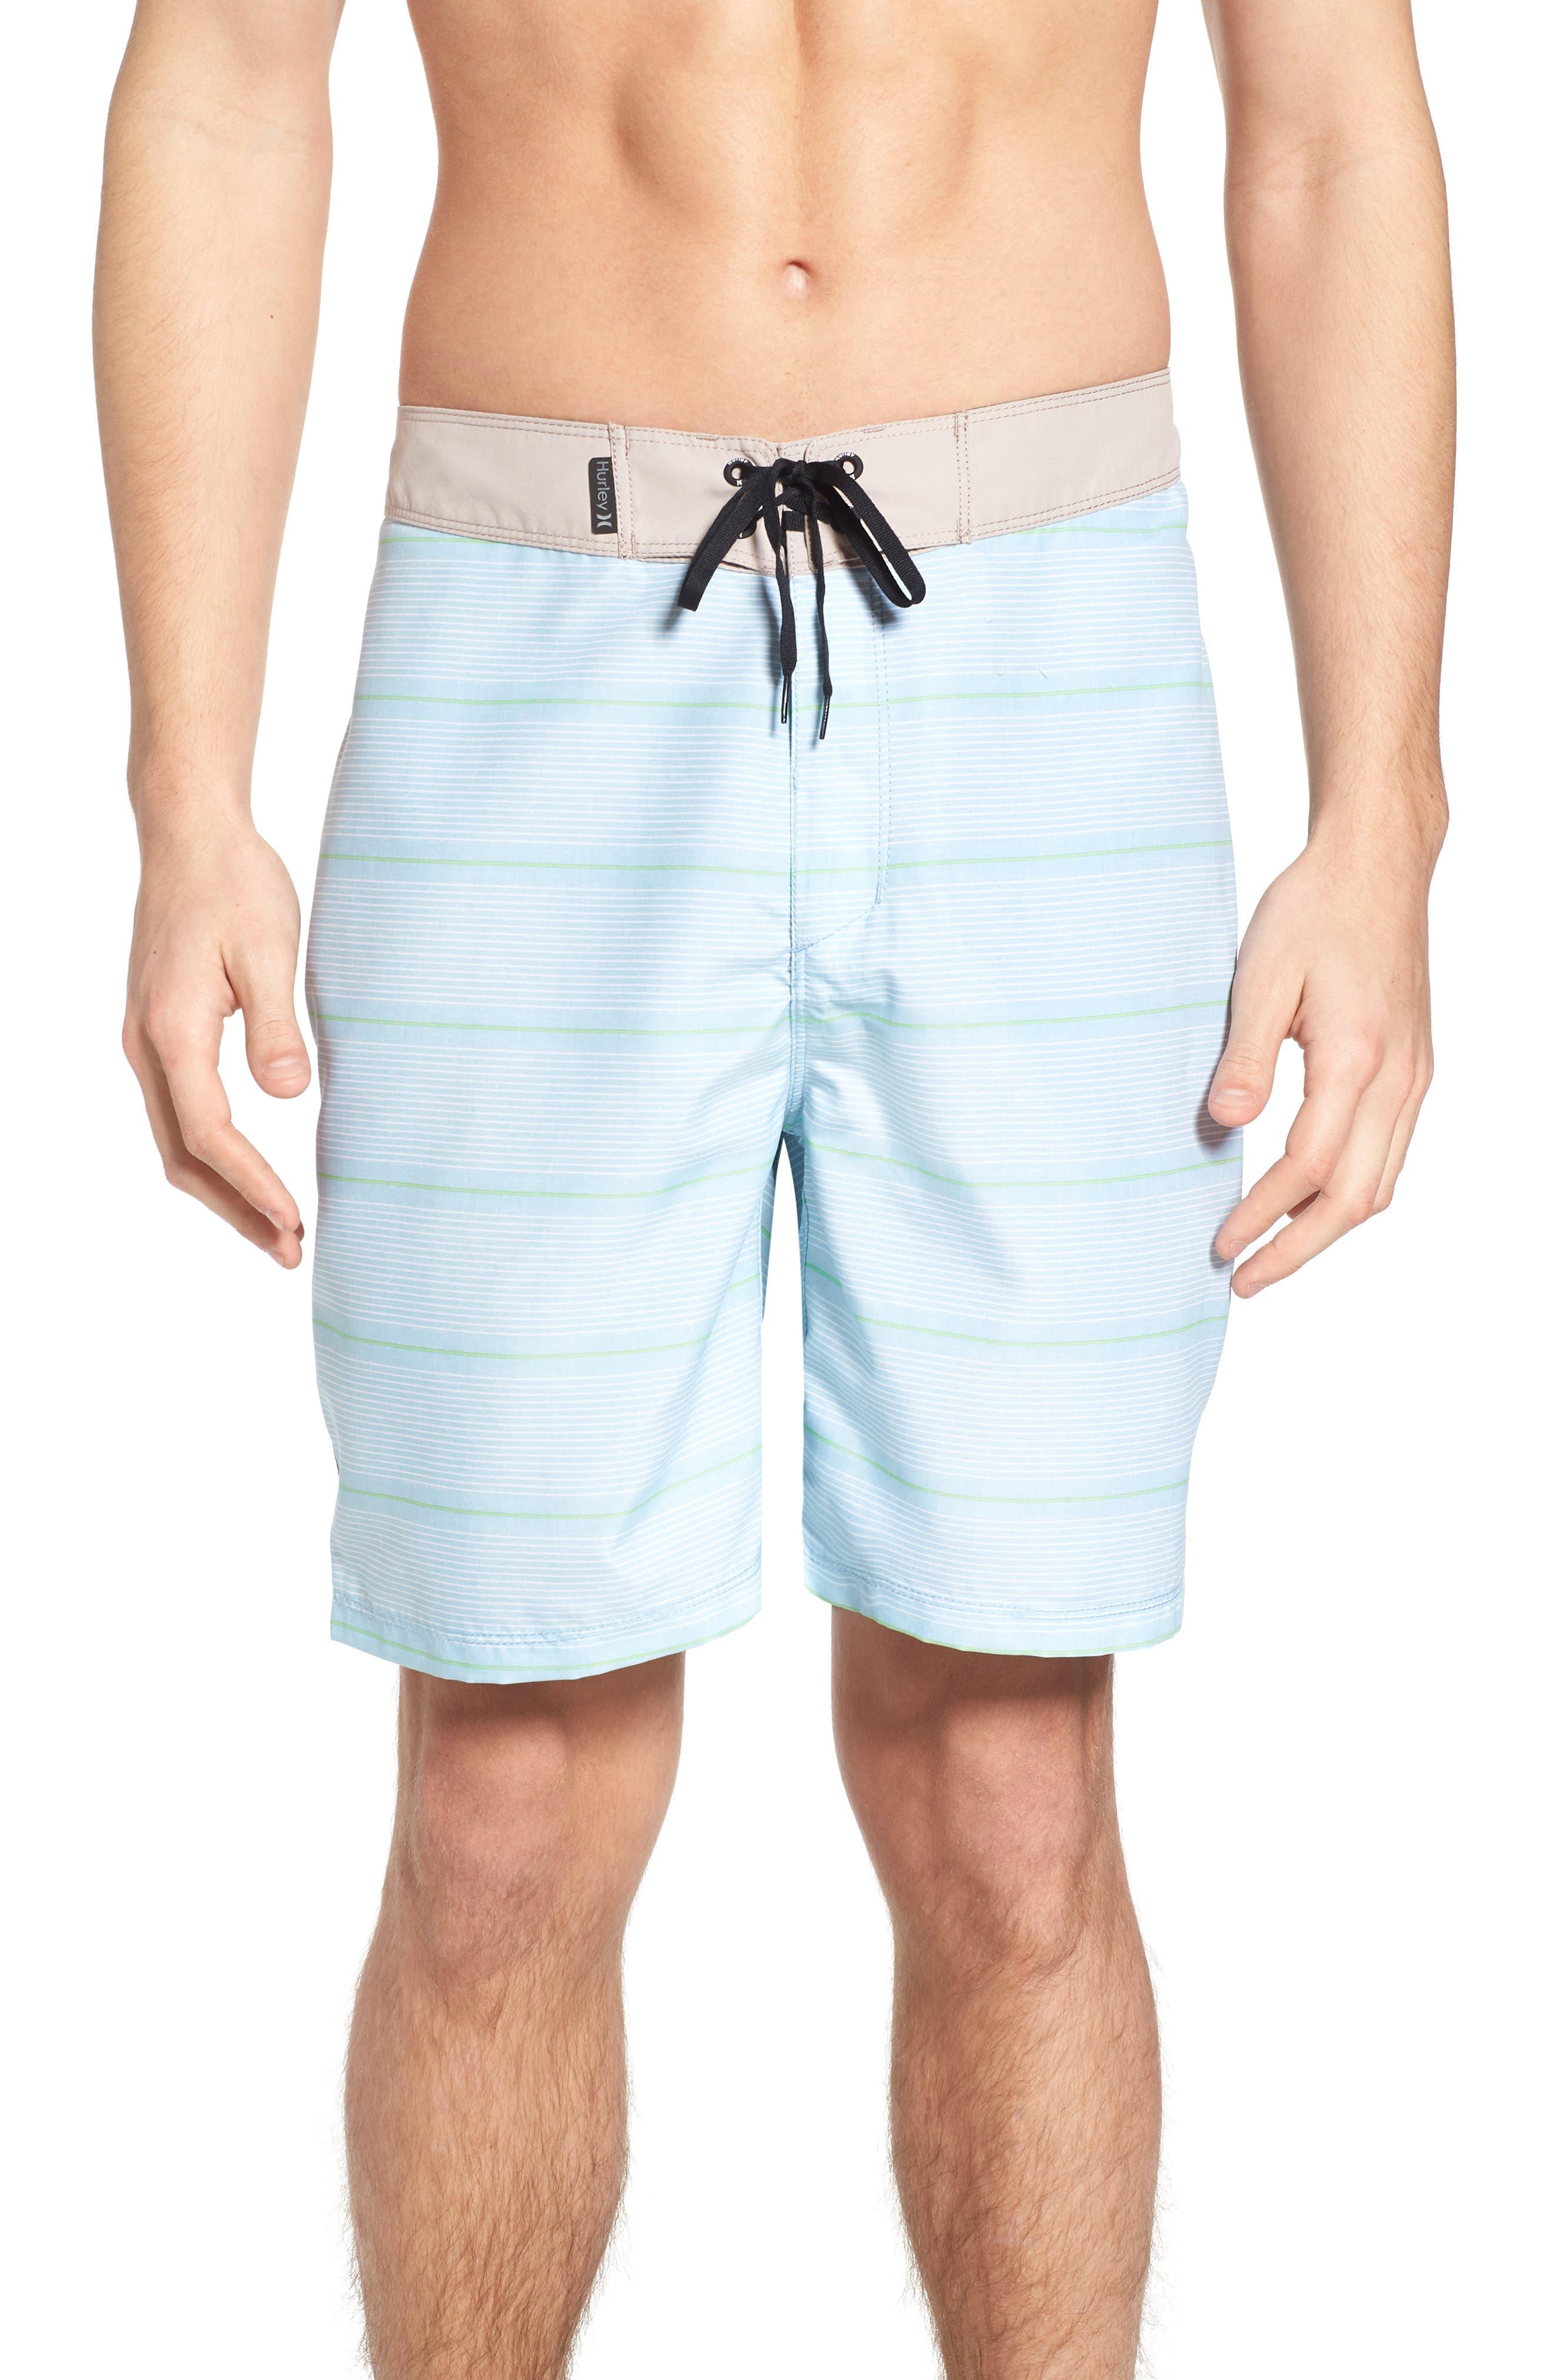 Shoreside Board Shorts,                             Main thumbnail 1, color,                             Ocean Bliss